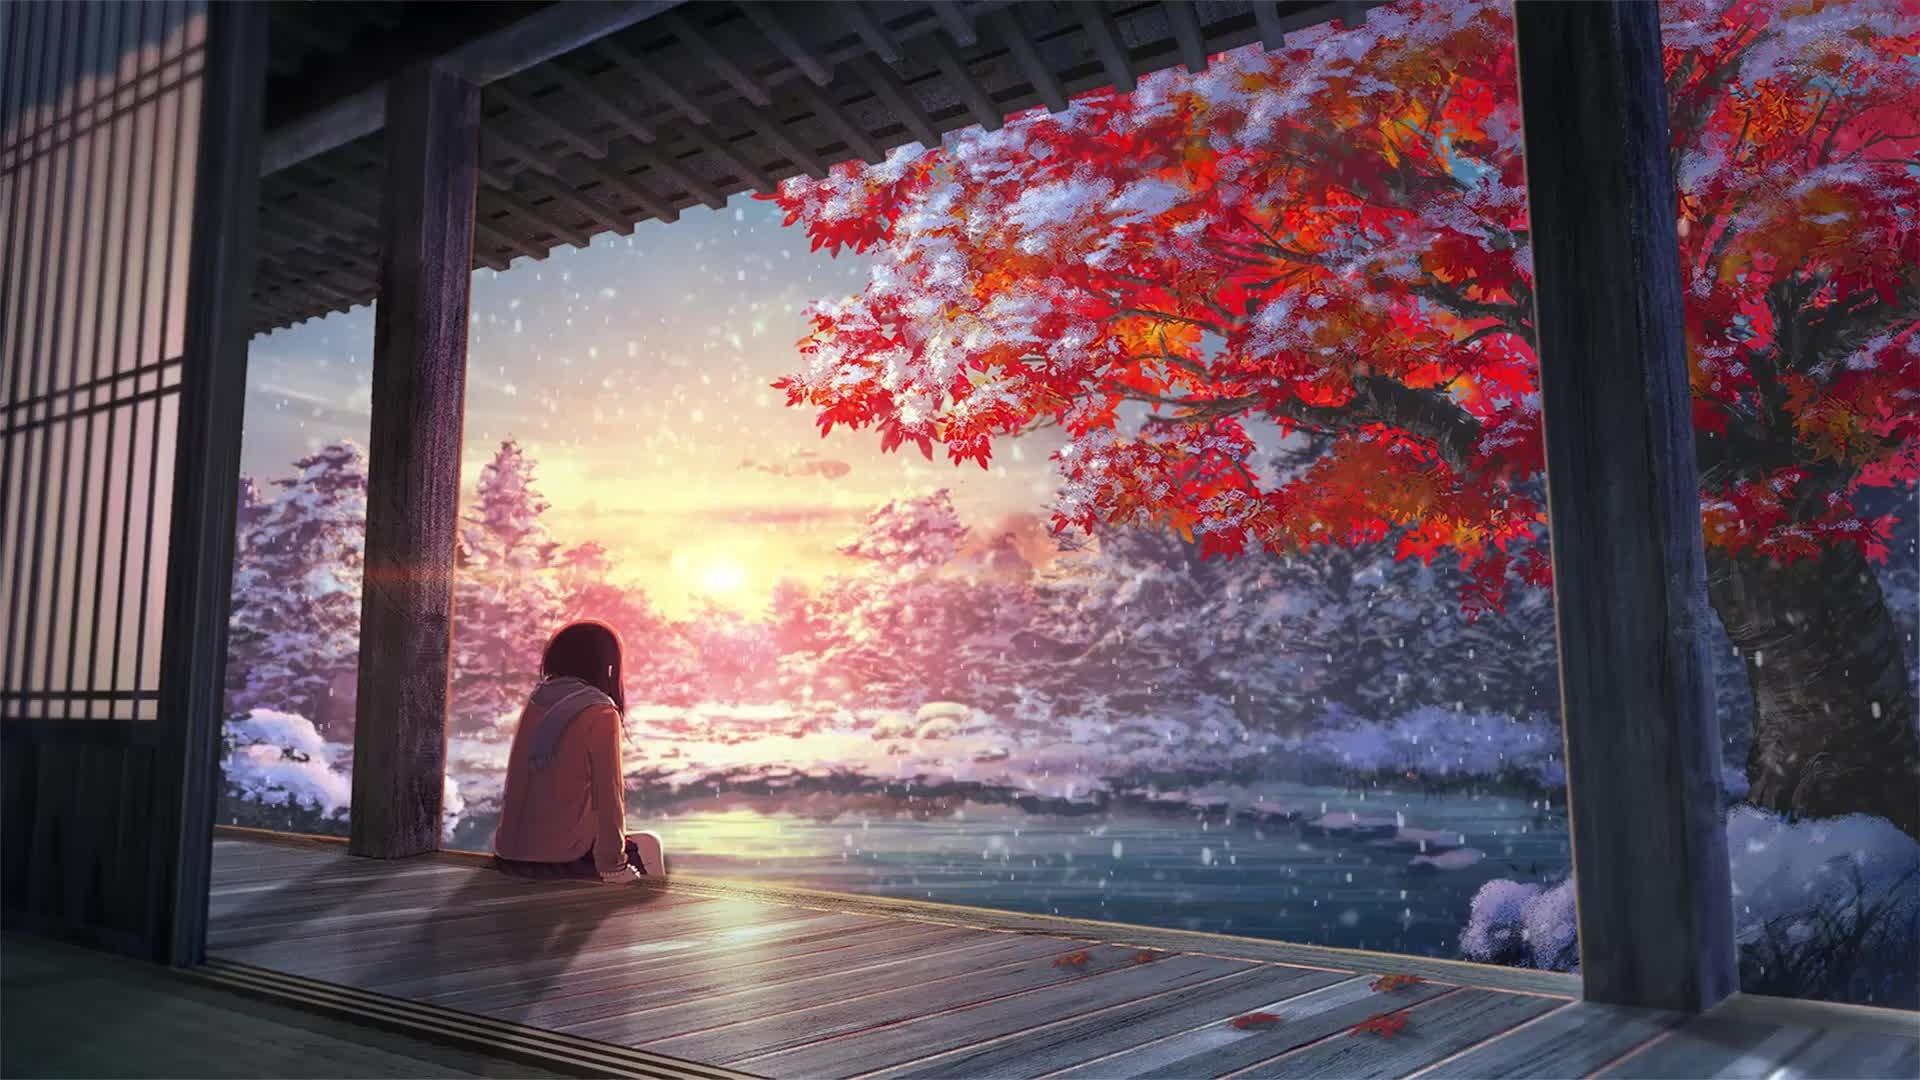 Chill HD Wallpaper